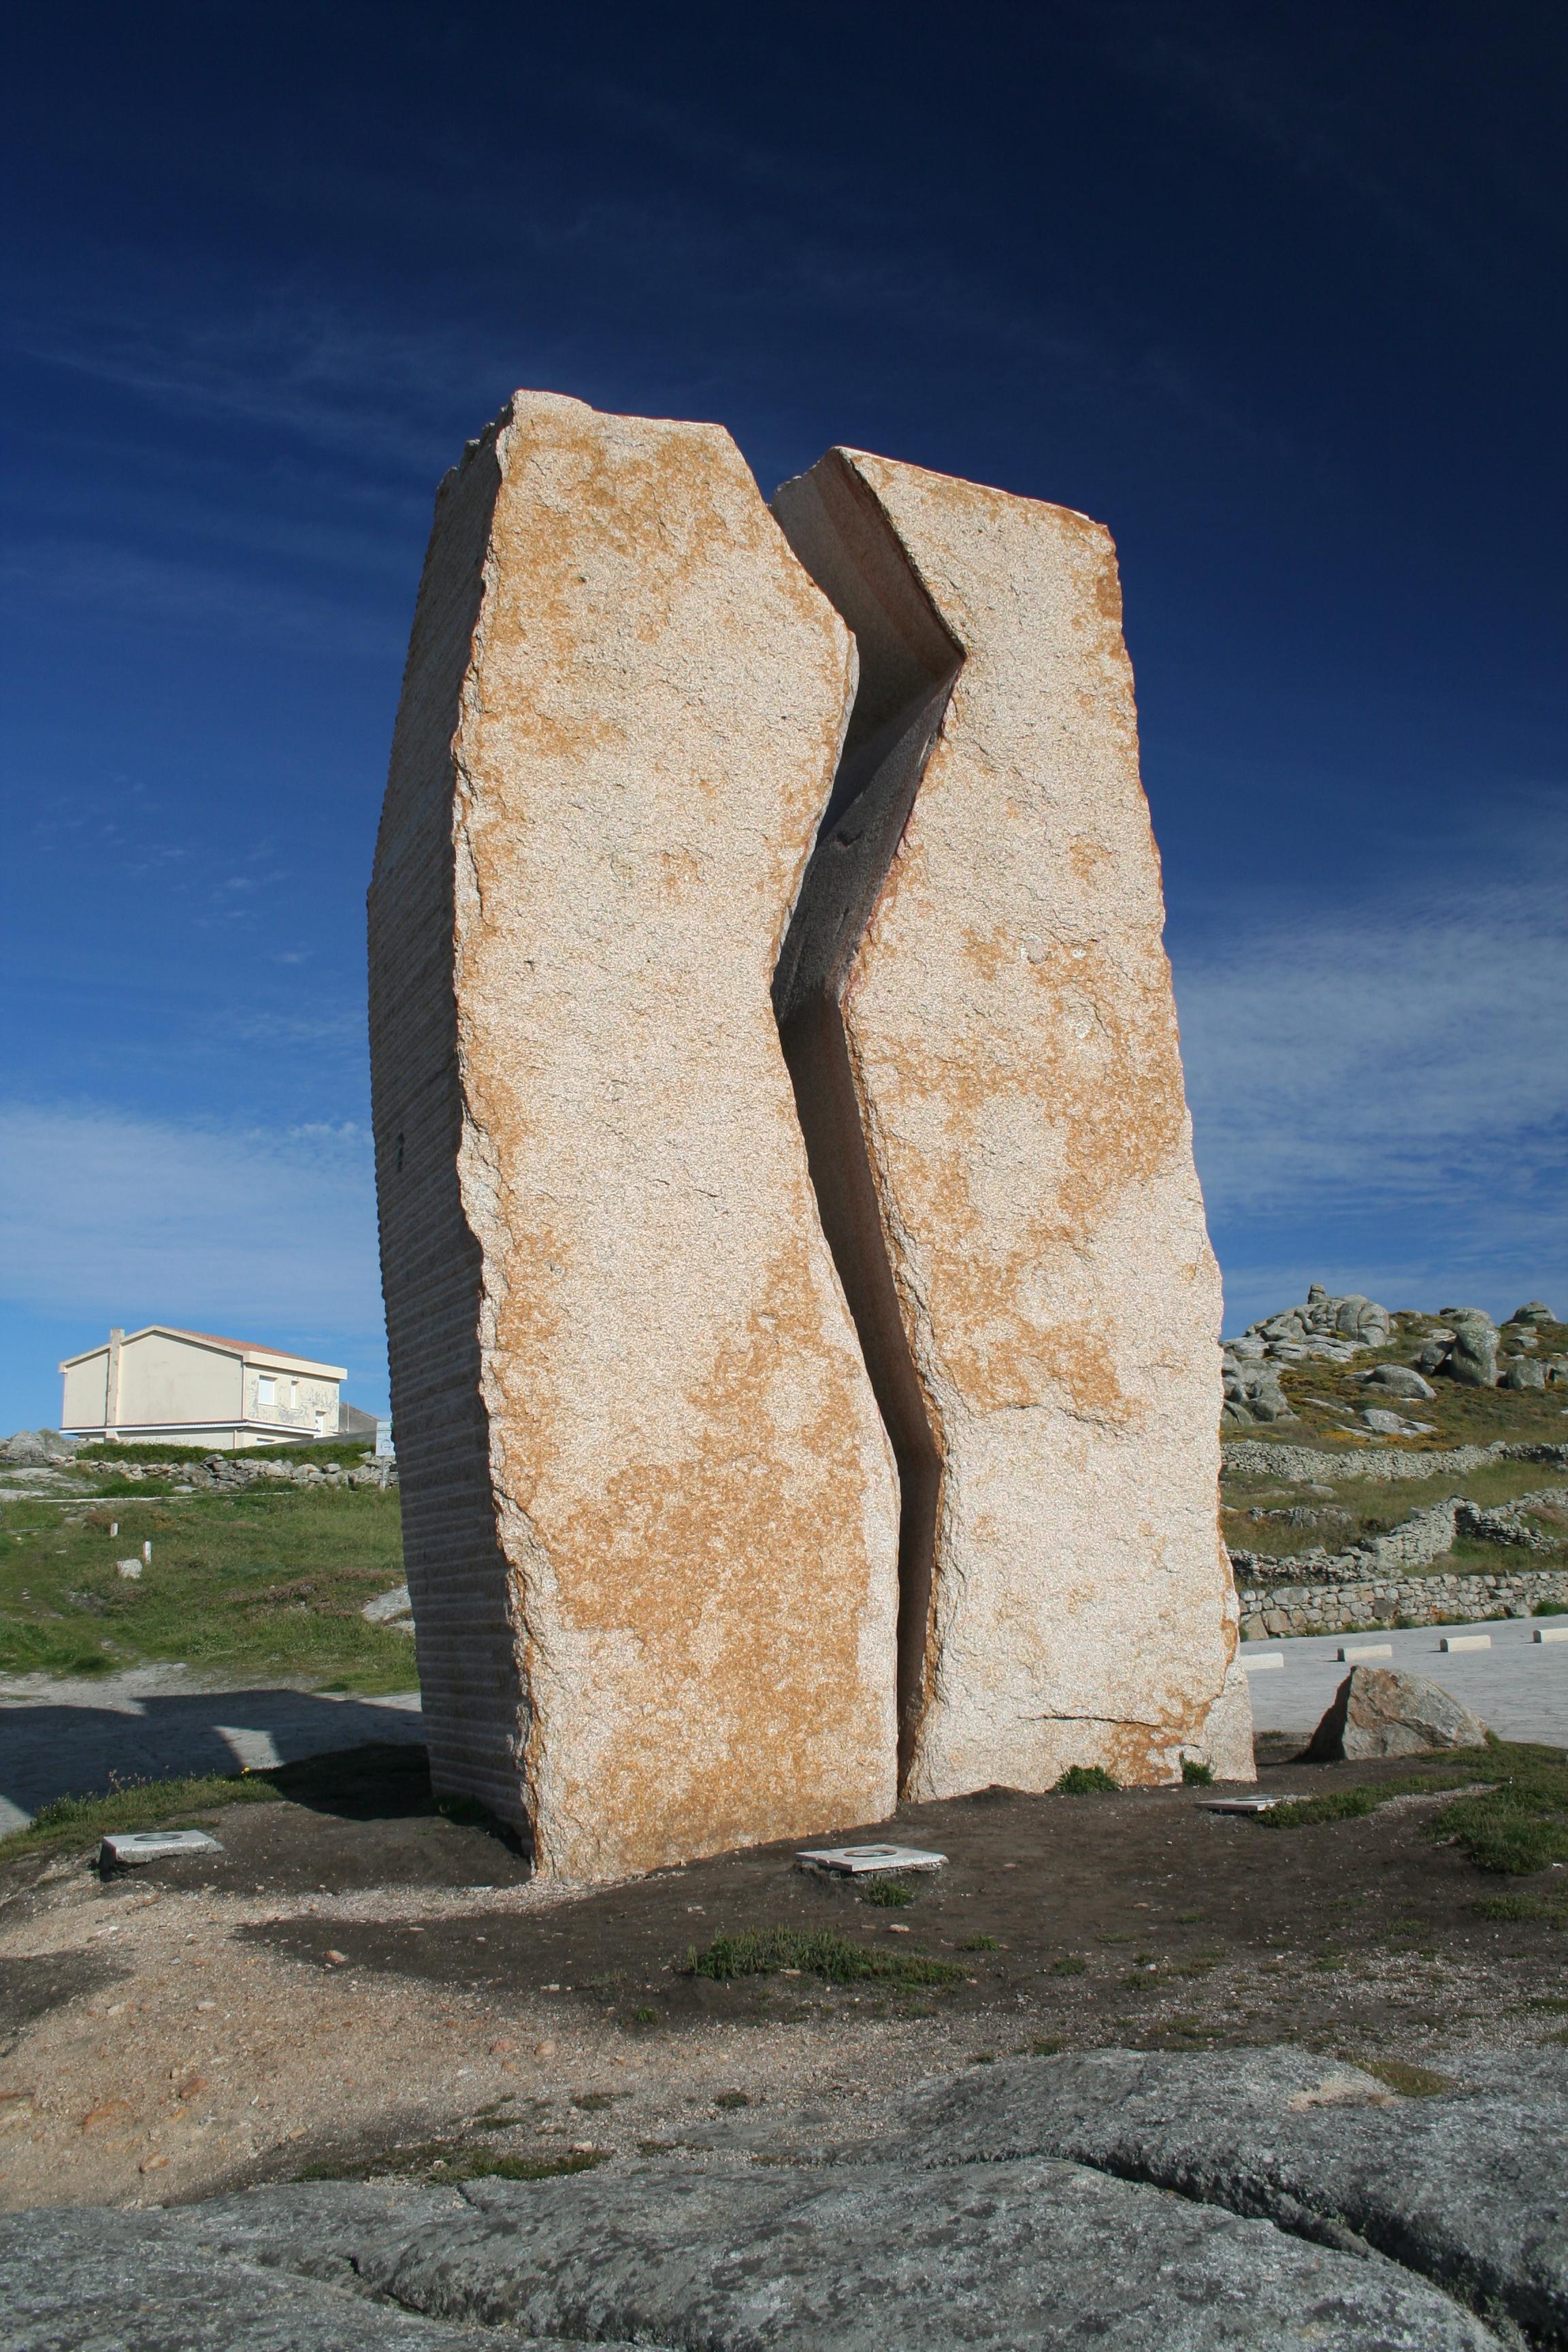 https://upload.wikimedia.org/wikipedia/commons/c/c8/Monumento_fronte_%C3%B3_Santuario_da_Virxe_da_Barca%2C_Mux%C3%ADa.jpg